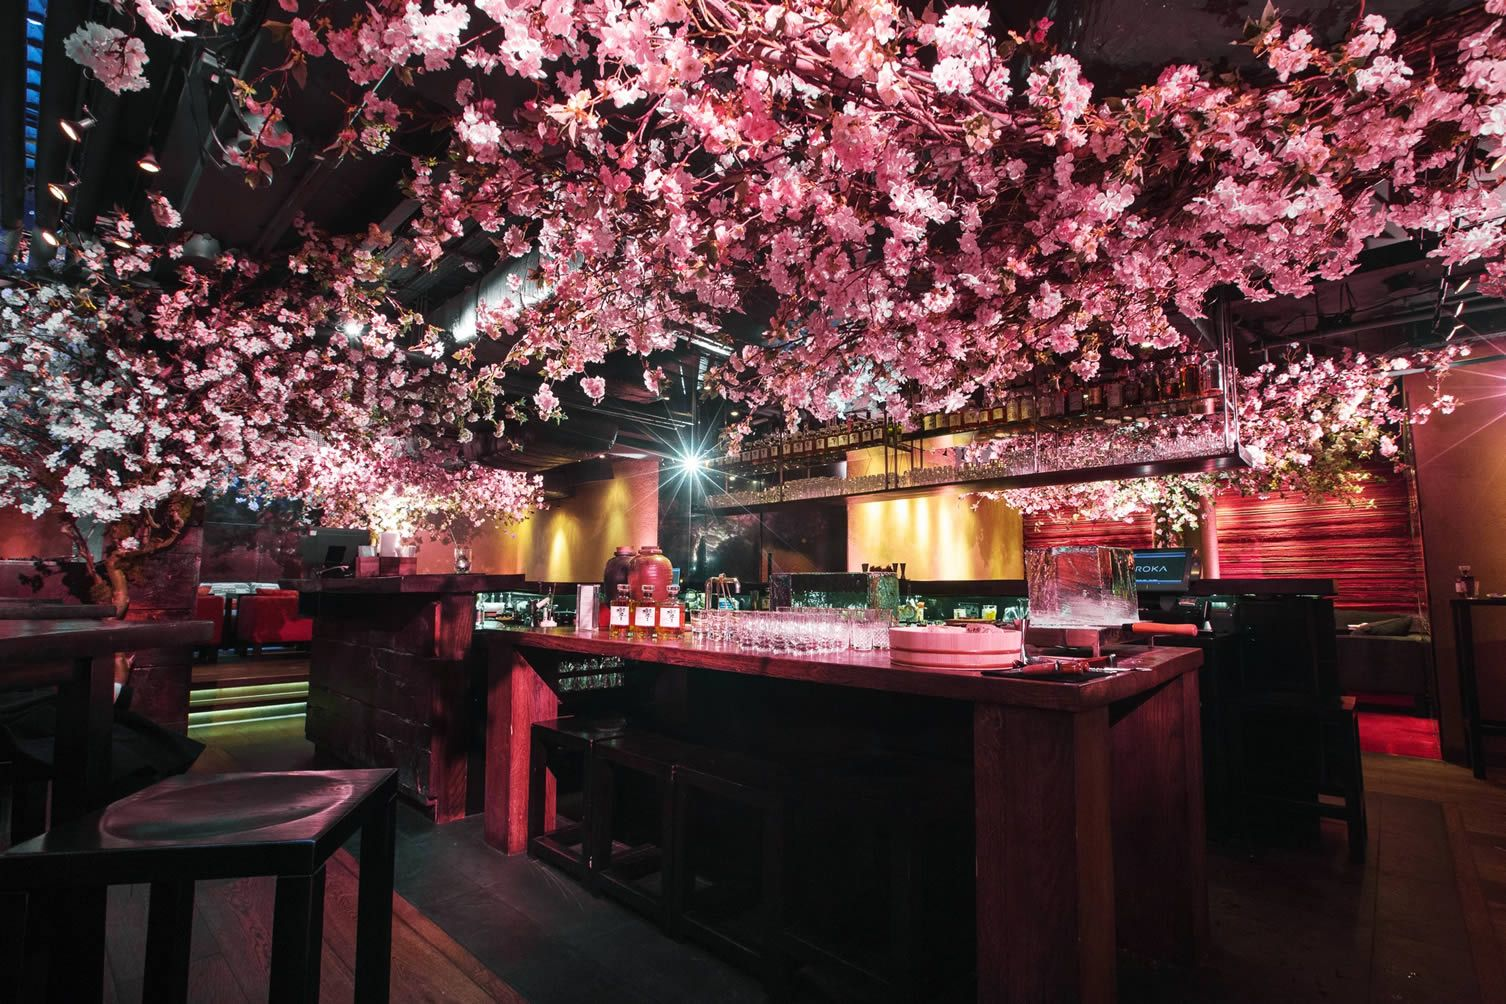 Suntory Team Up With London S Japanese Restaurant Roka To Celebrate The Season Of Cherry Blossom Restaurant Interieur Restaurant Ontwerp Interieur